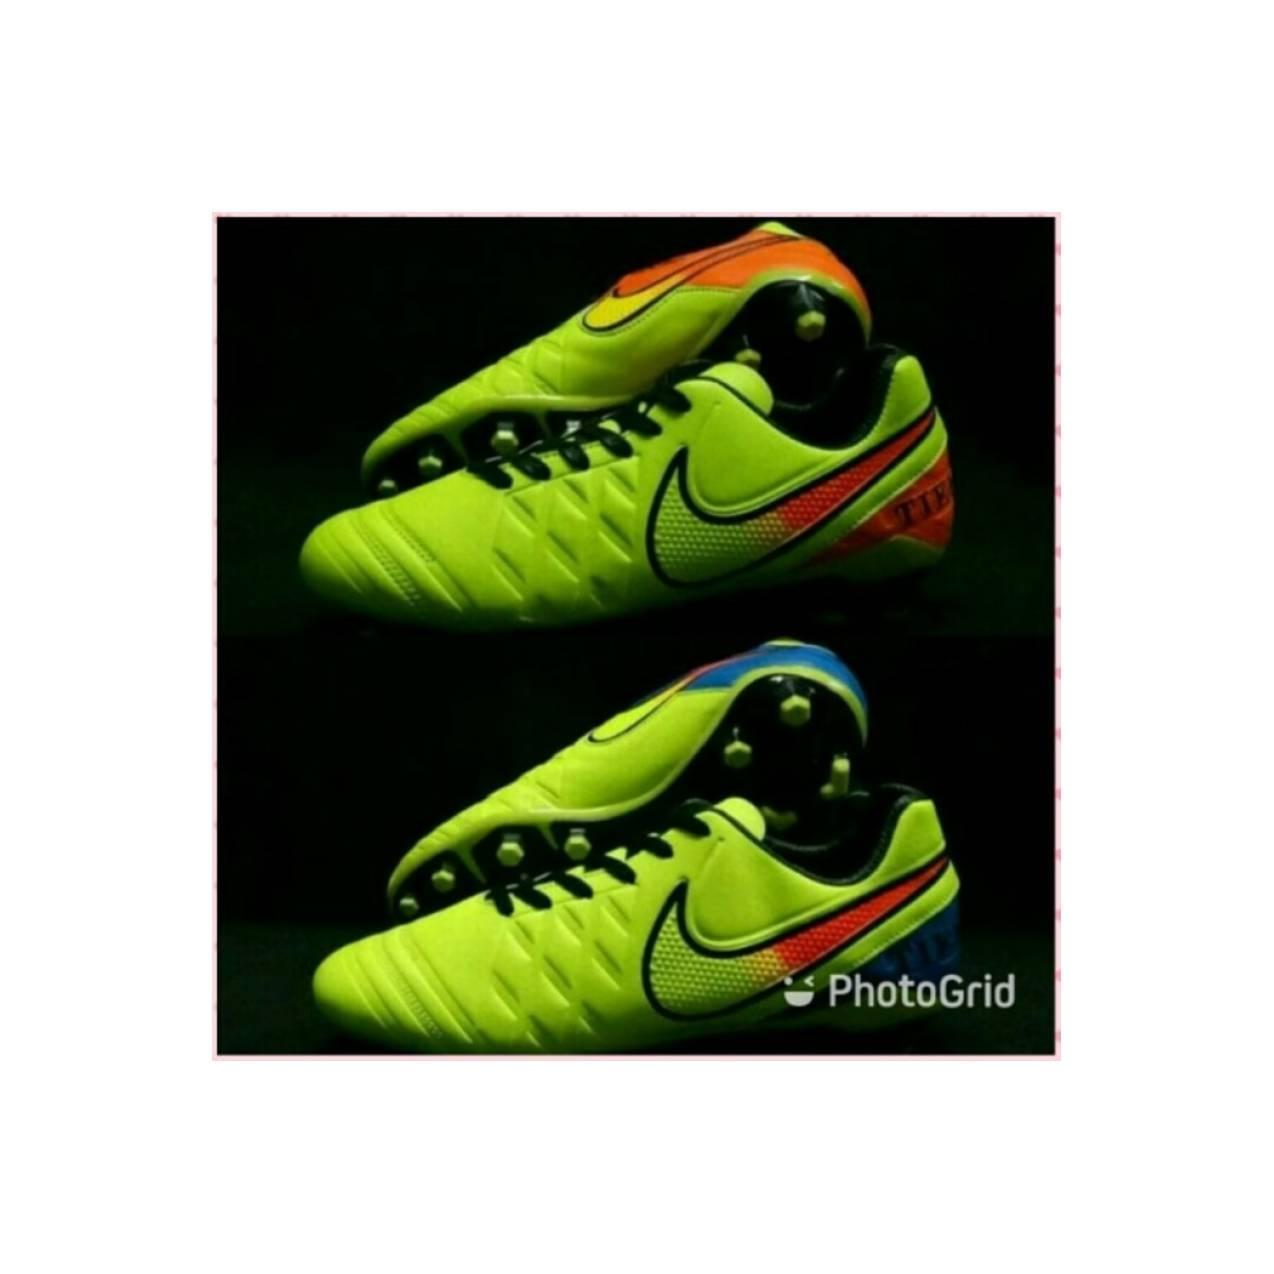 Ogardo Pele Sepatu Futsal Pria Blue Orange Daftar Harga Terlengkap Nike Hypervenom Phelon Ii Ic 749898 703 Hijau Bola Tiempo Legend Hitam Oren